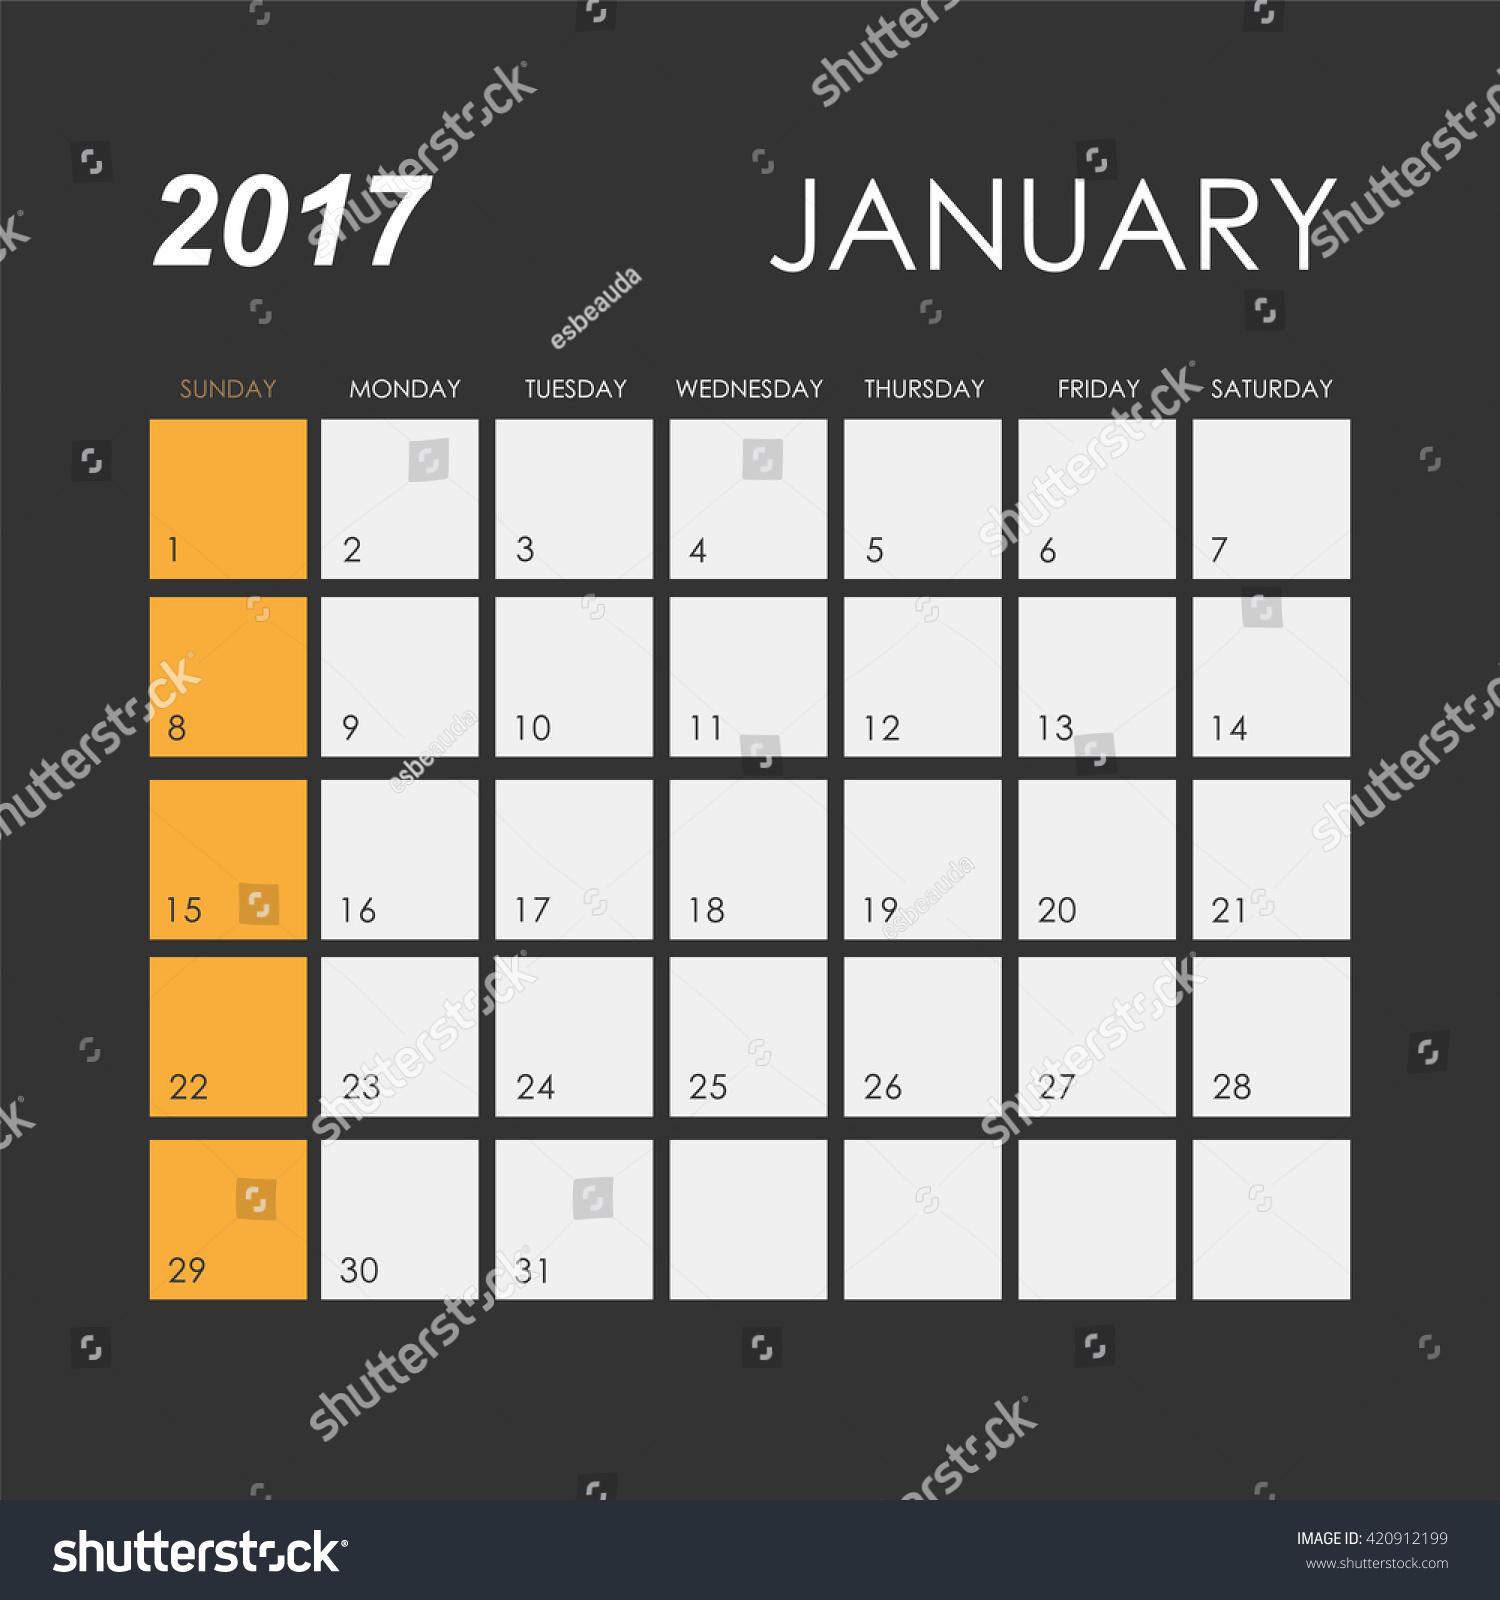 template calendar january 2017 stock vector royalty free 420912199